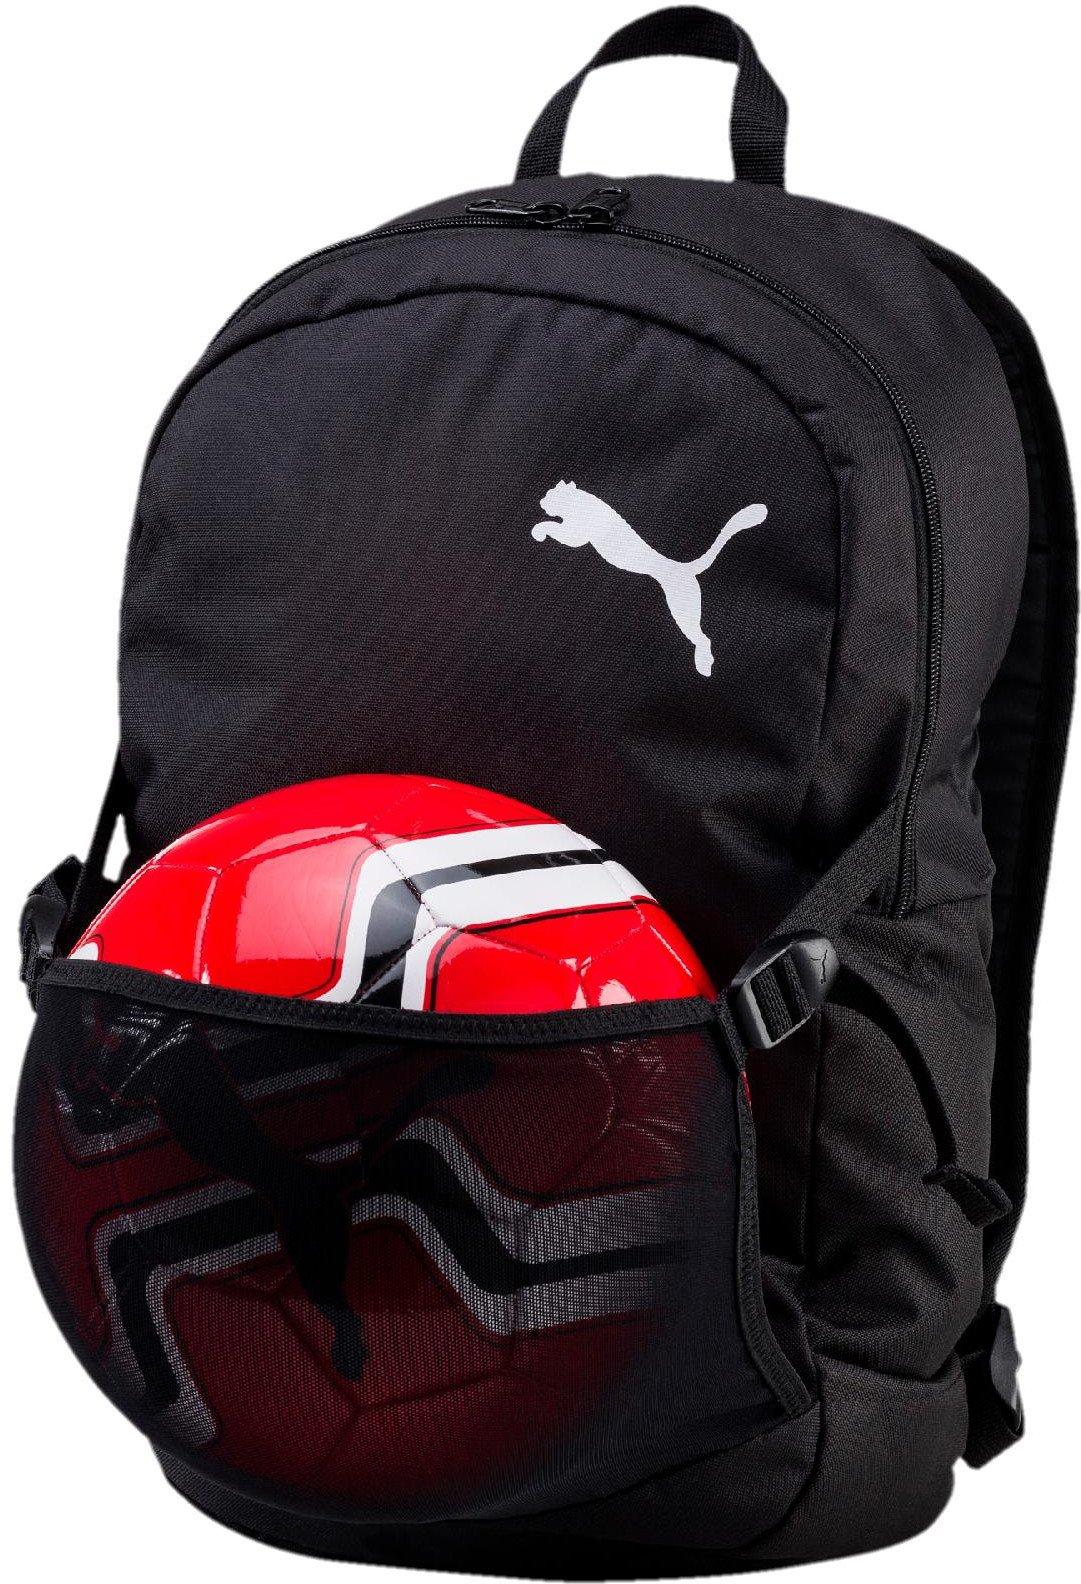 Fotbalový batoh Puma Pro Training II BN